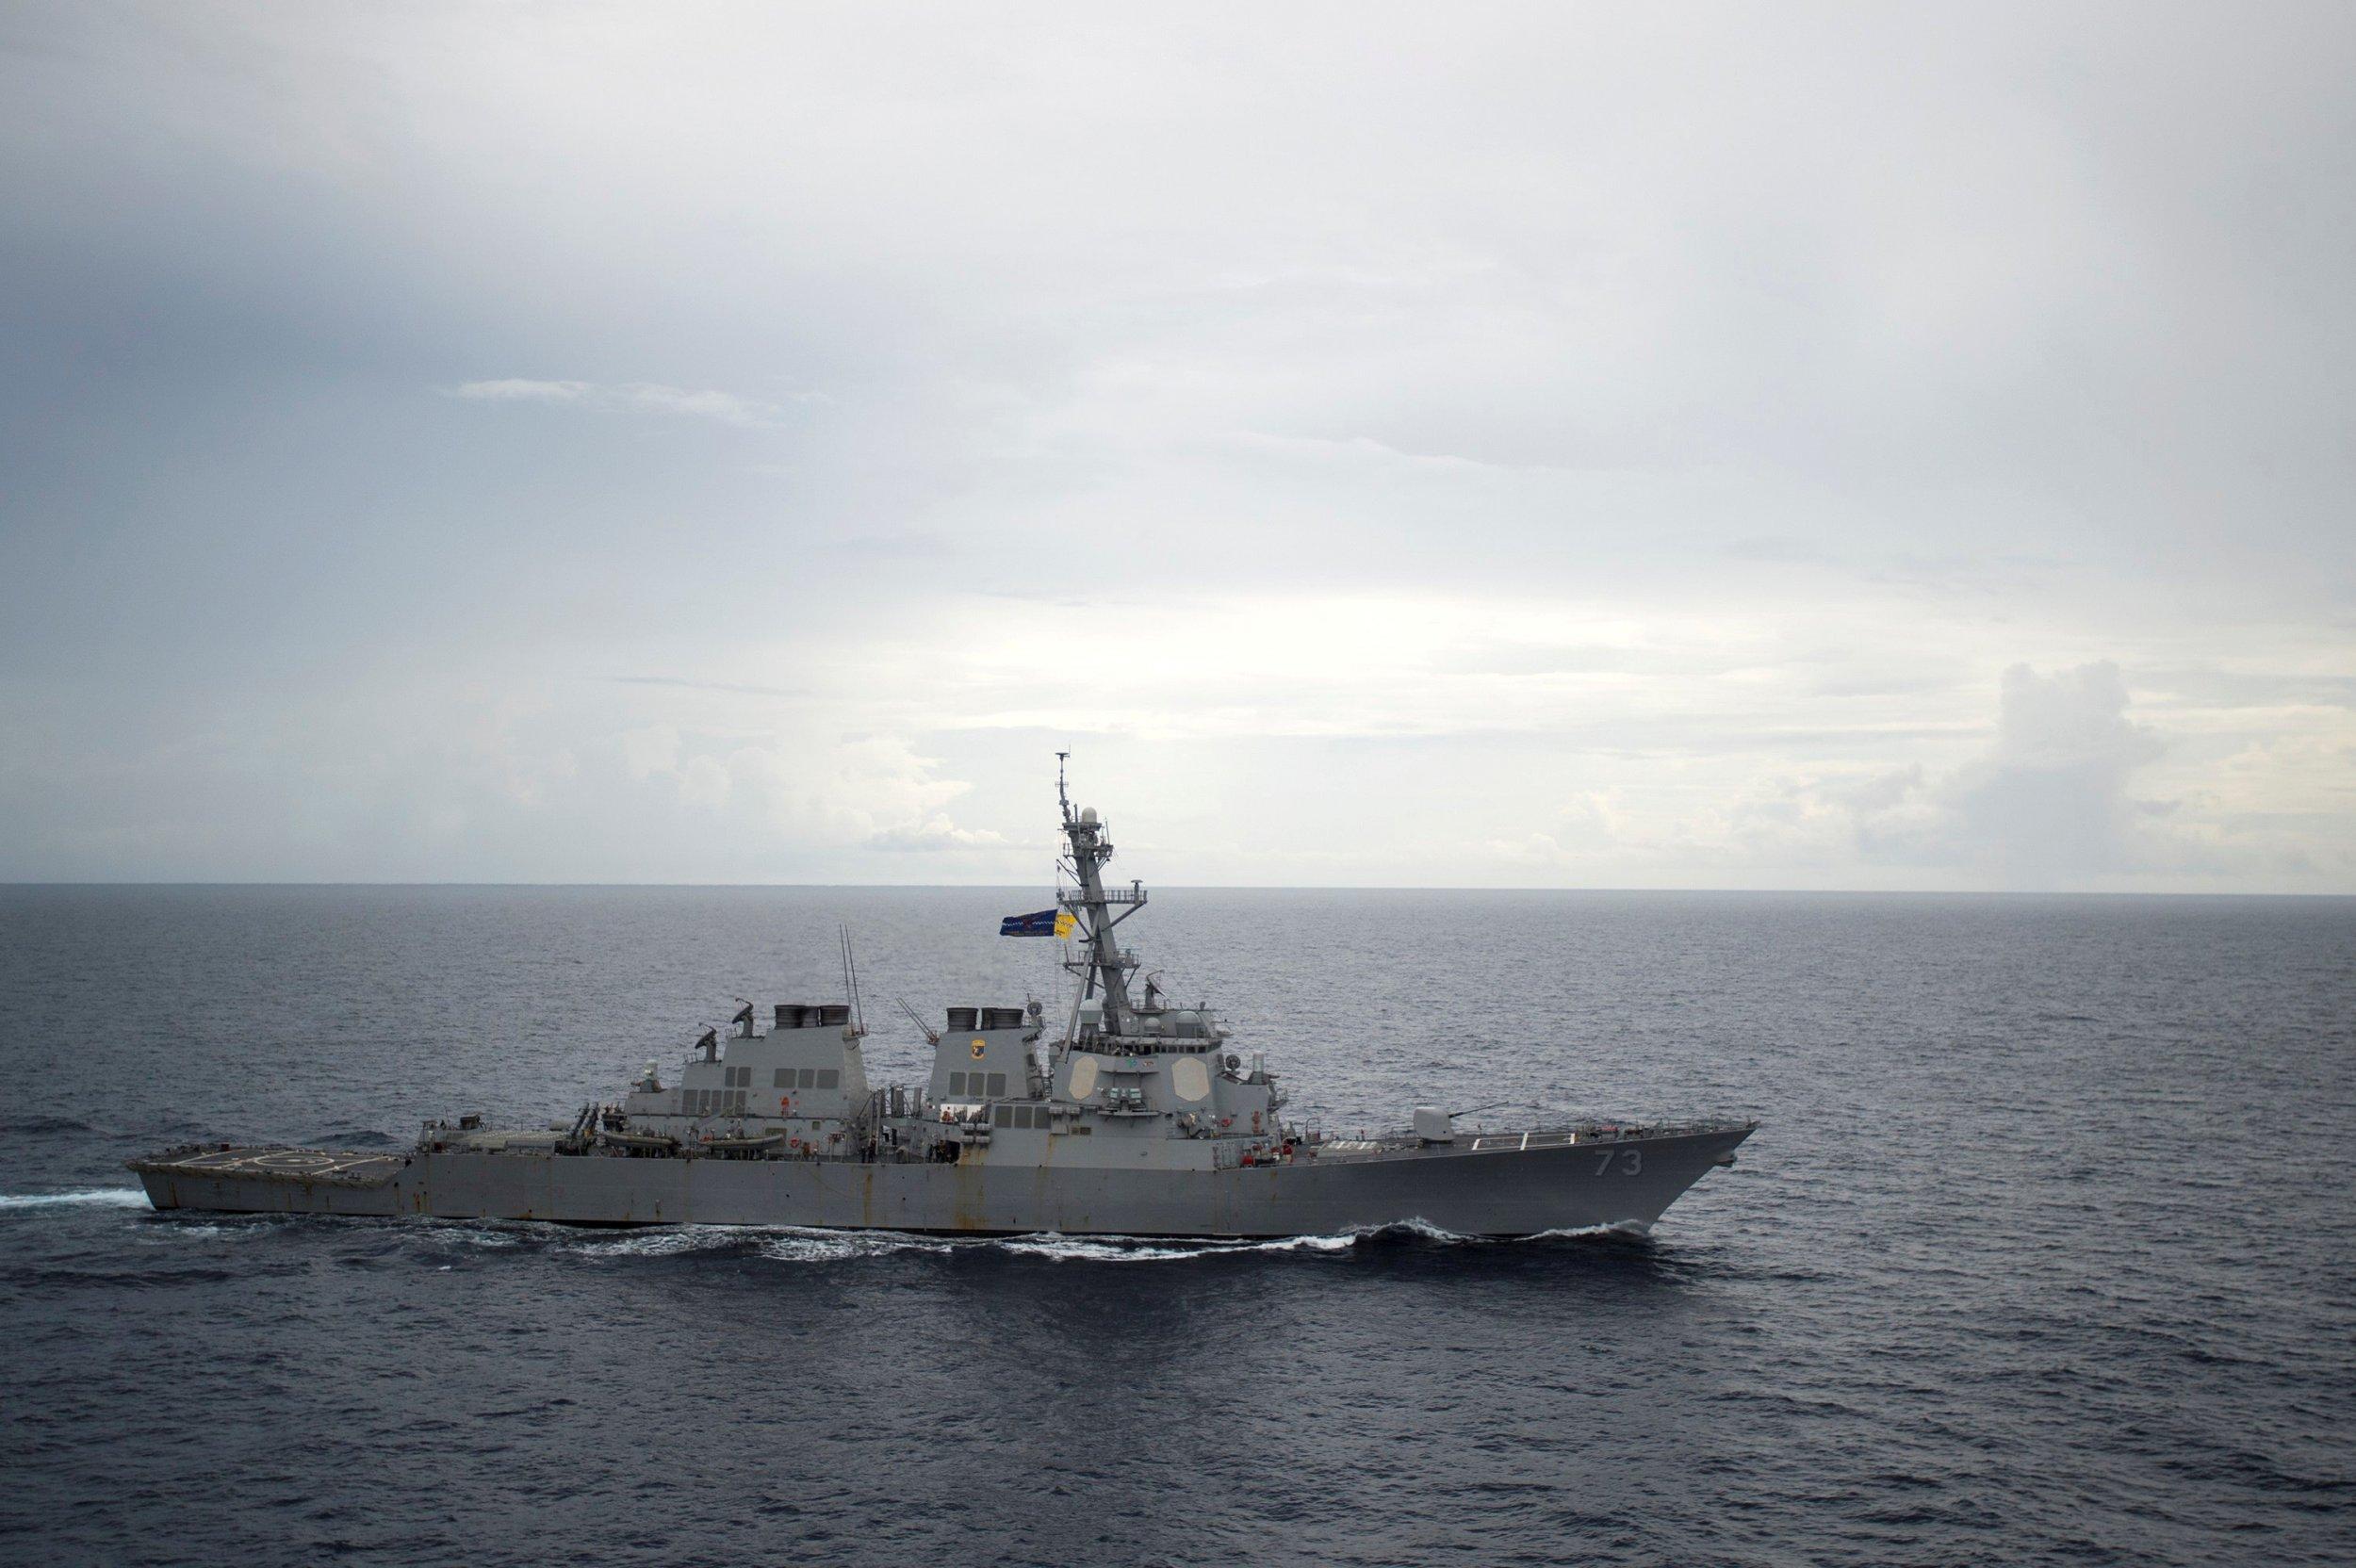 China Returns U.S. Drone Seized in South China Sea